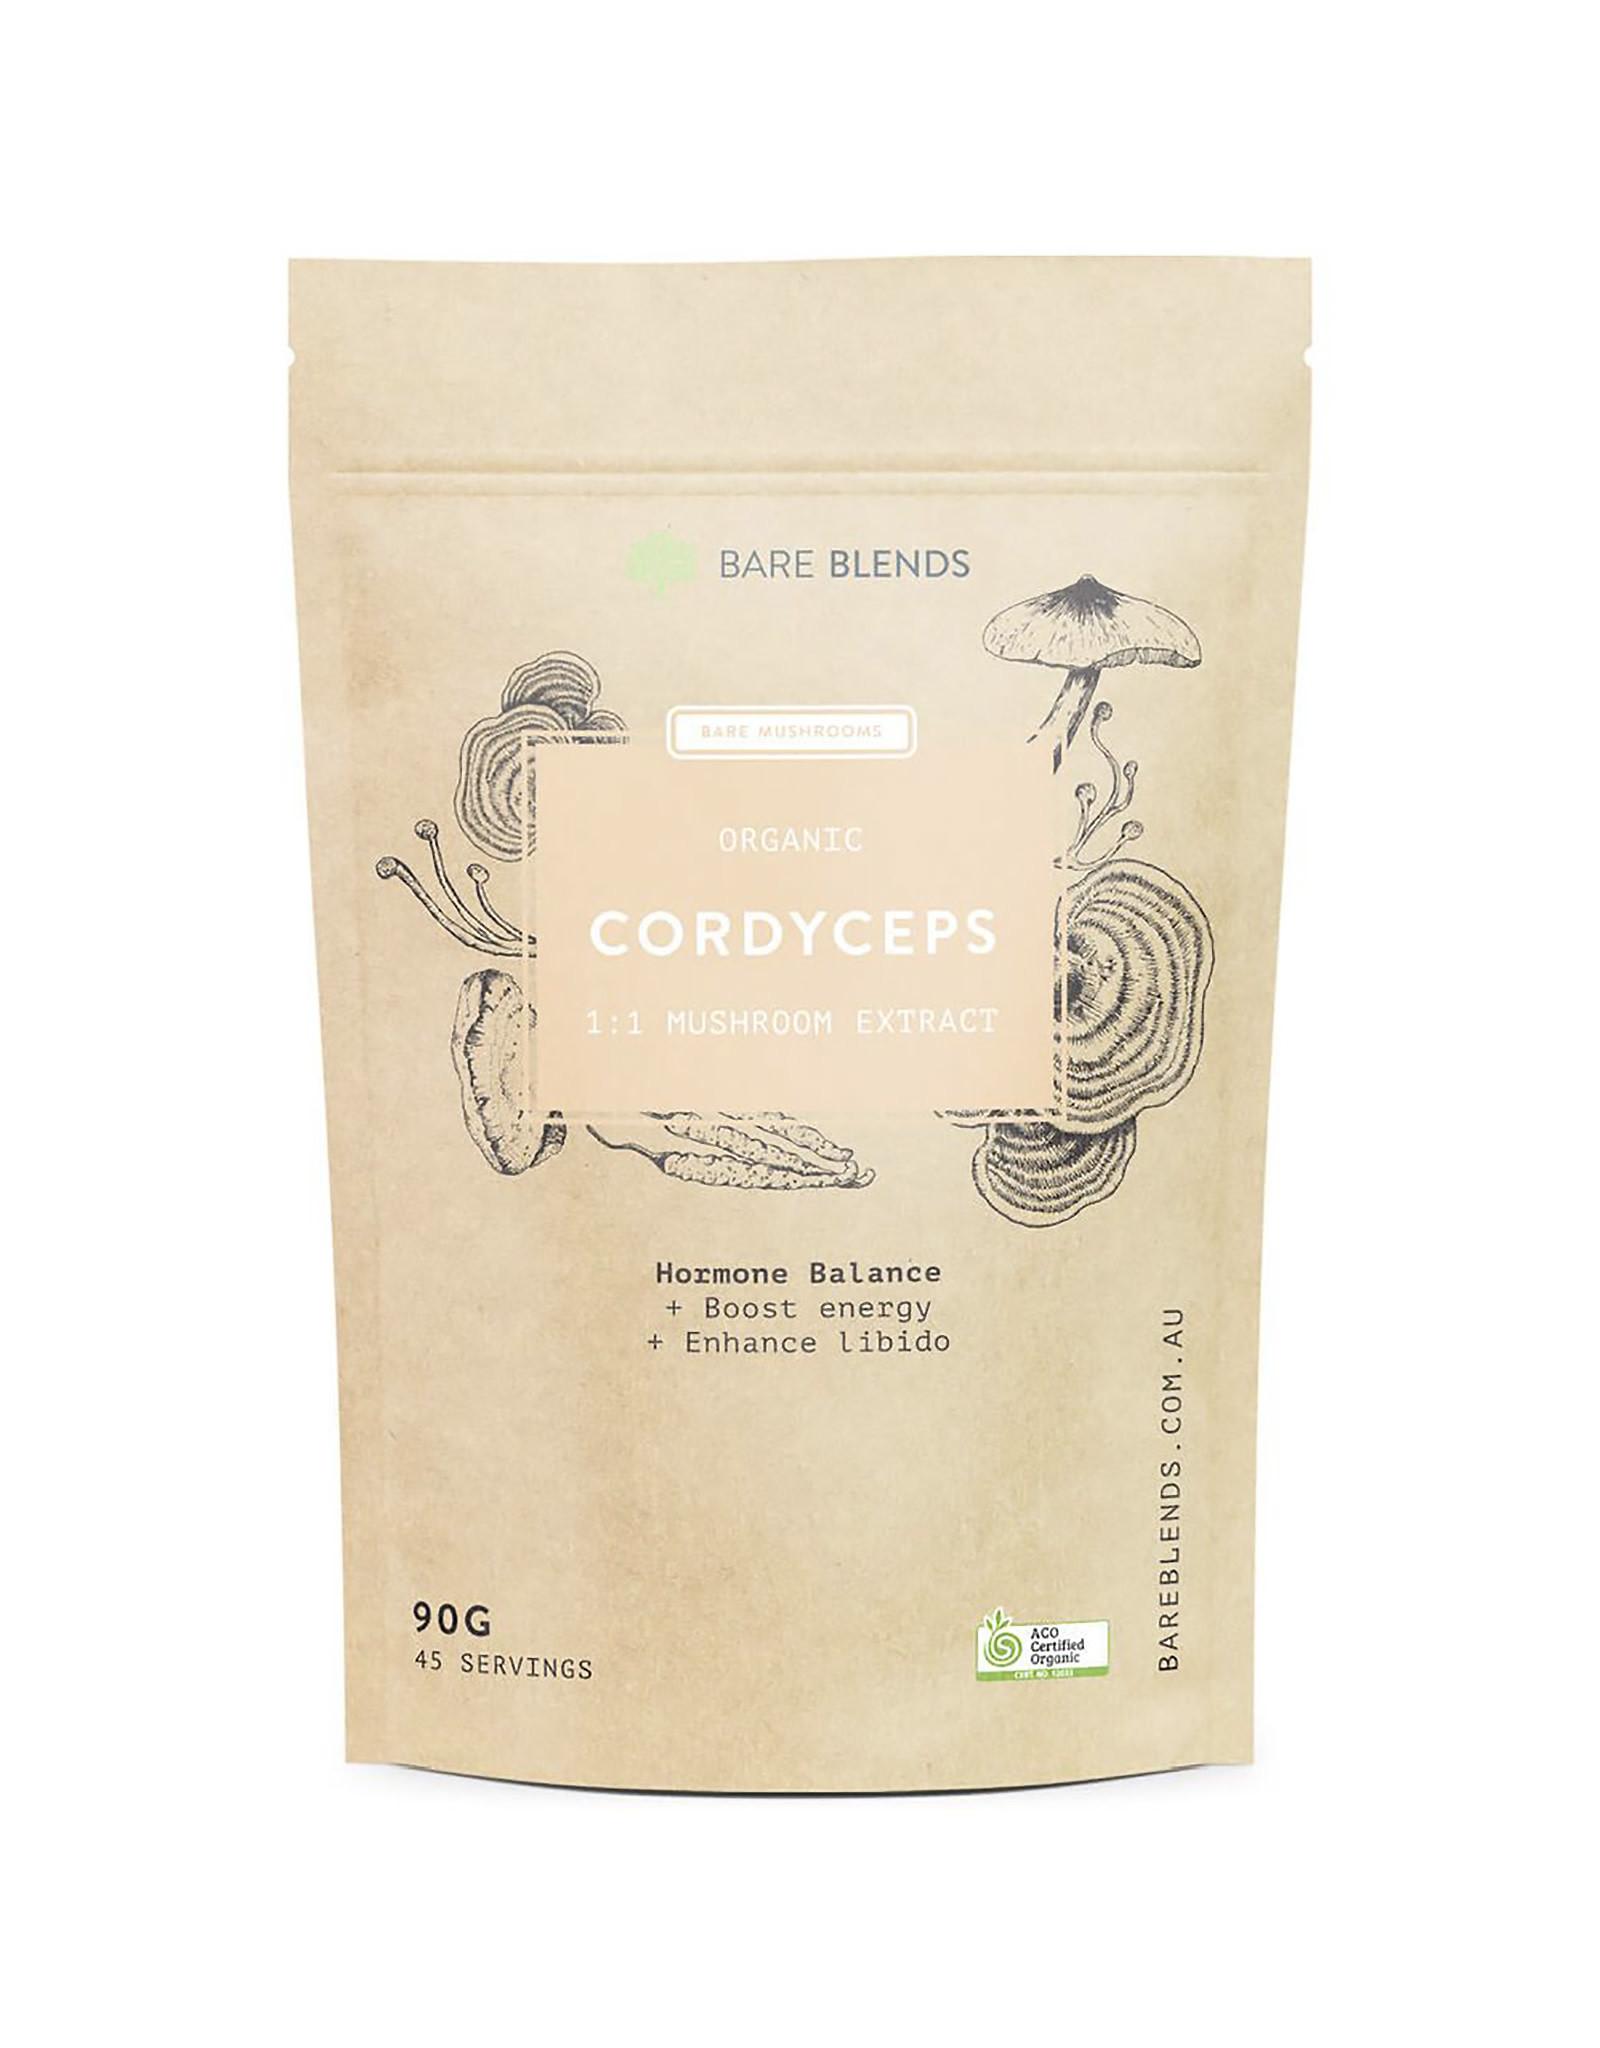 Bare Blends Cordyceps Mushroom Extract - Organic - 90g